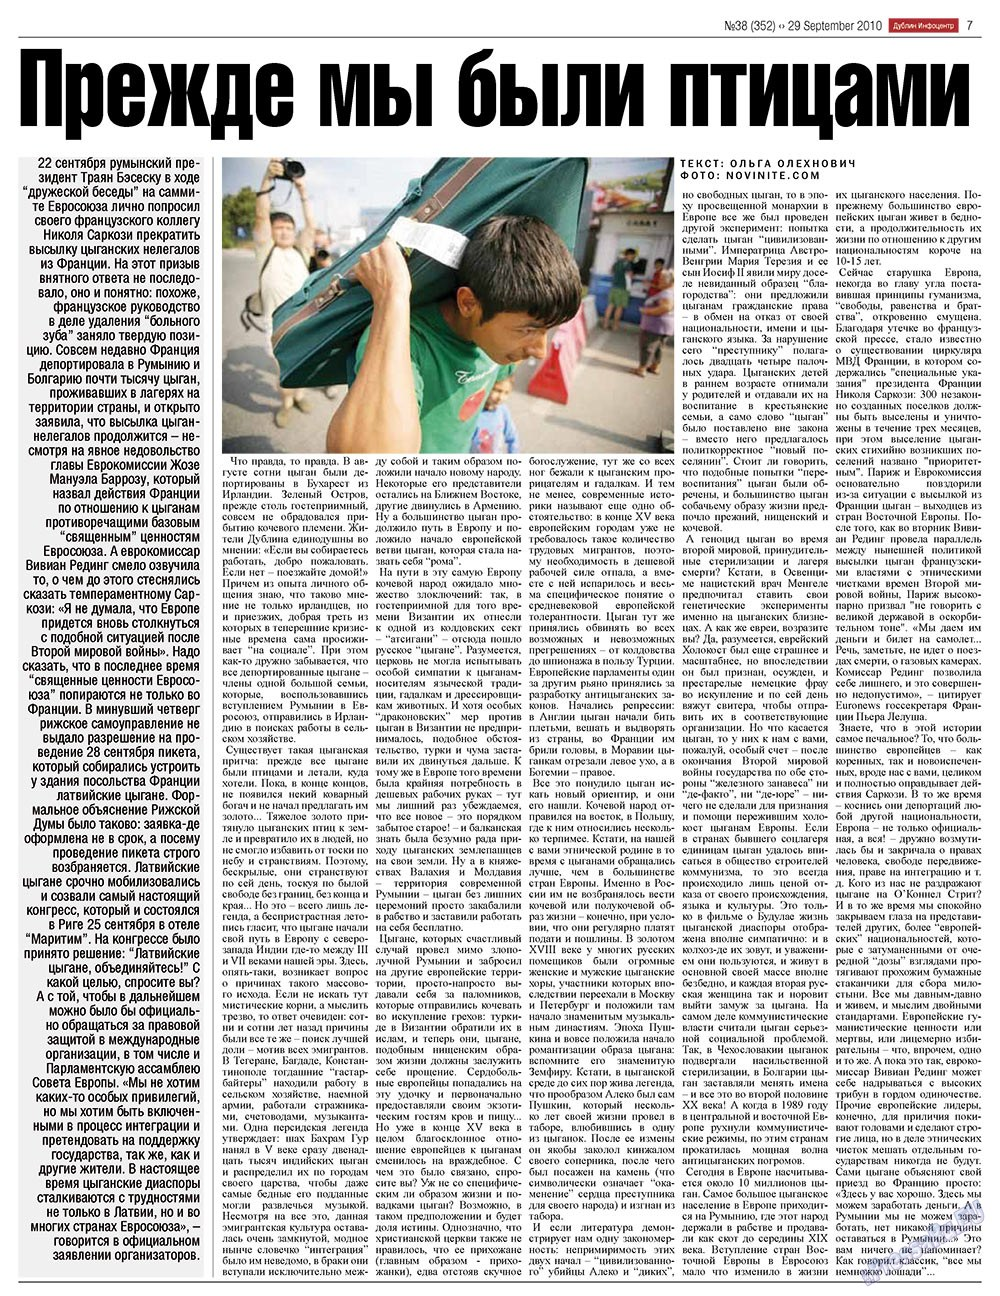 Дублин инфоцентр (газета). 2010 год, номер 38, стр. 7